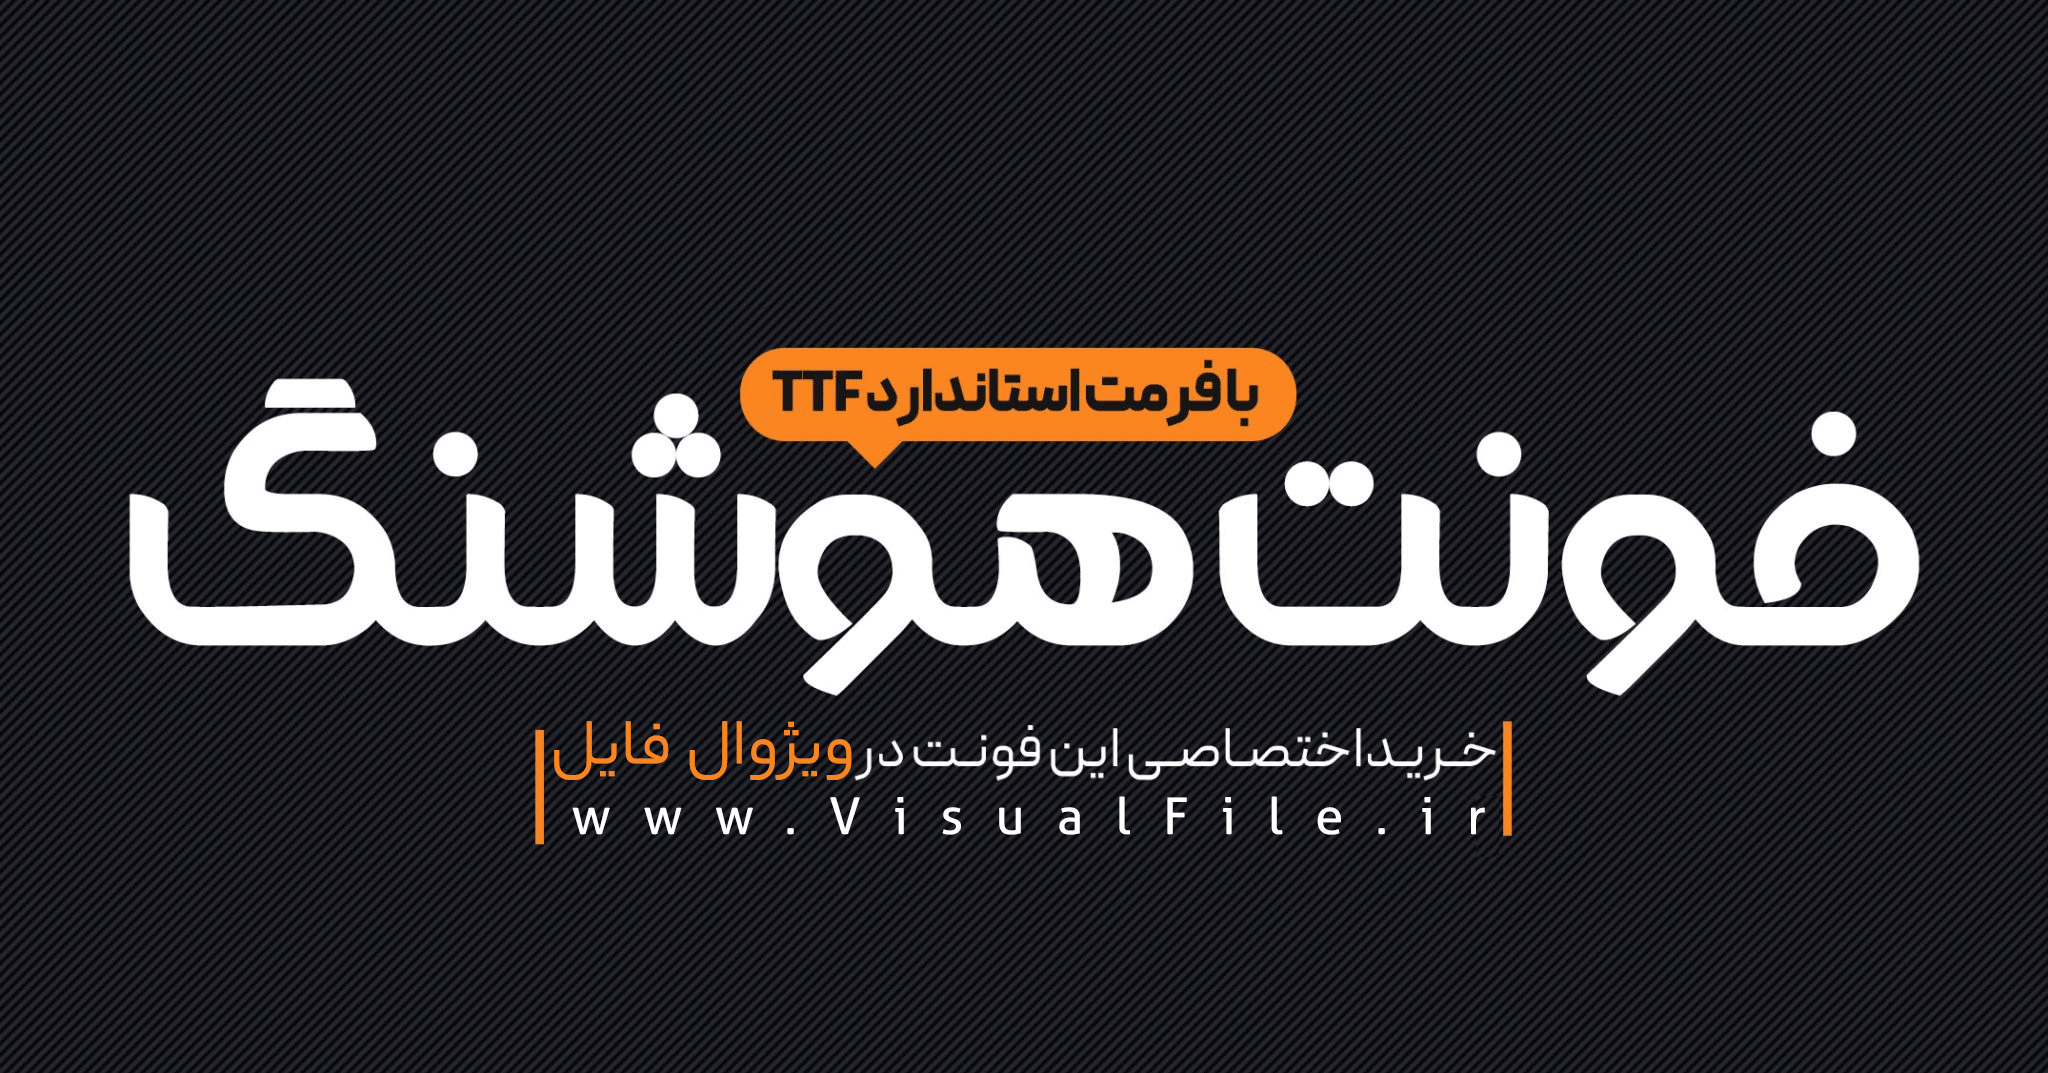 فونت فارسی هوشنگ